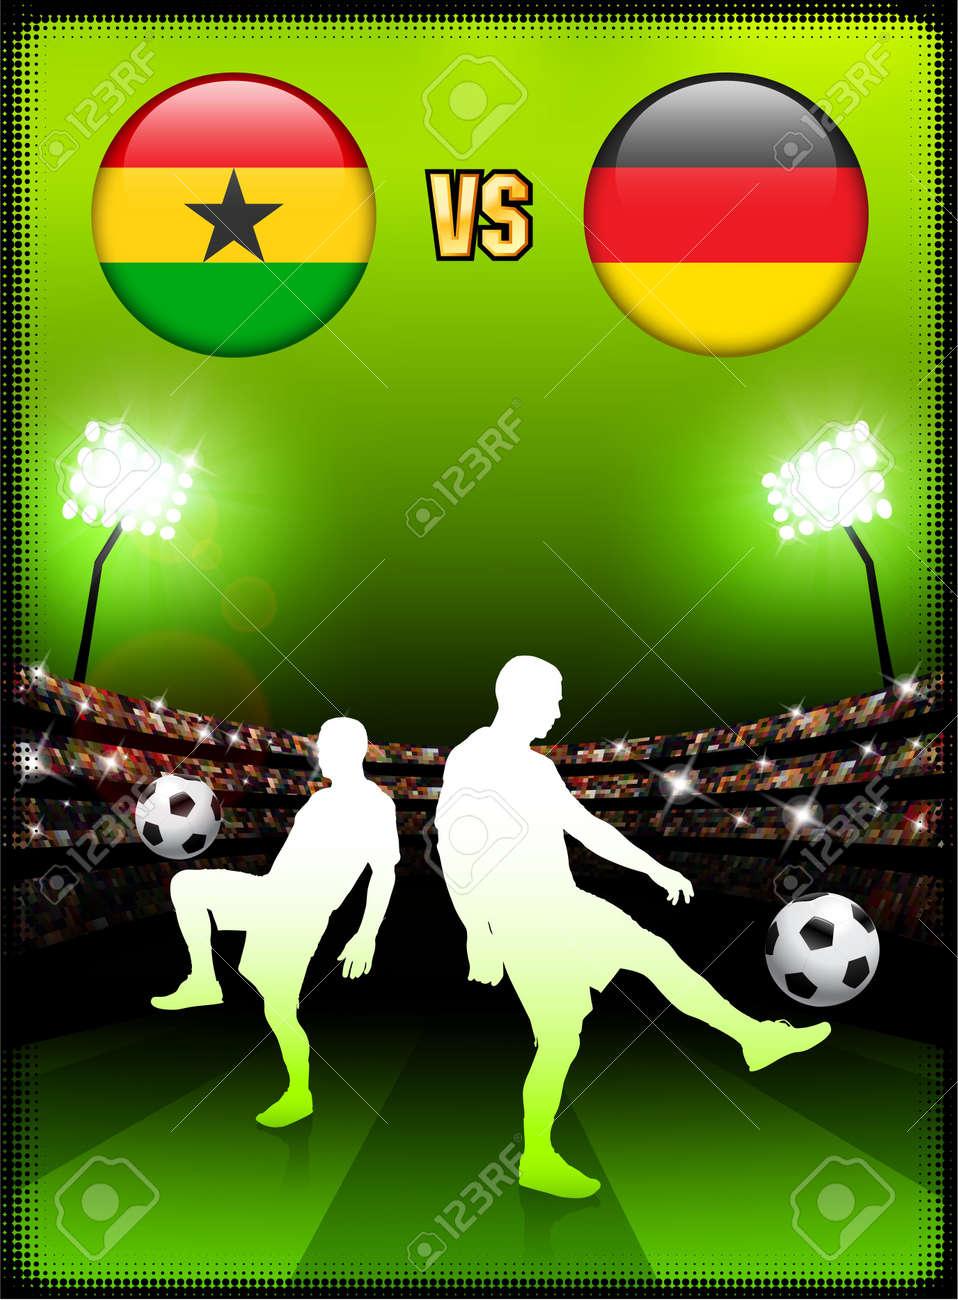 Ghana versus Germany on Stadium Event BackgroundOriginal Illustration Stock Illustration - 7138156